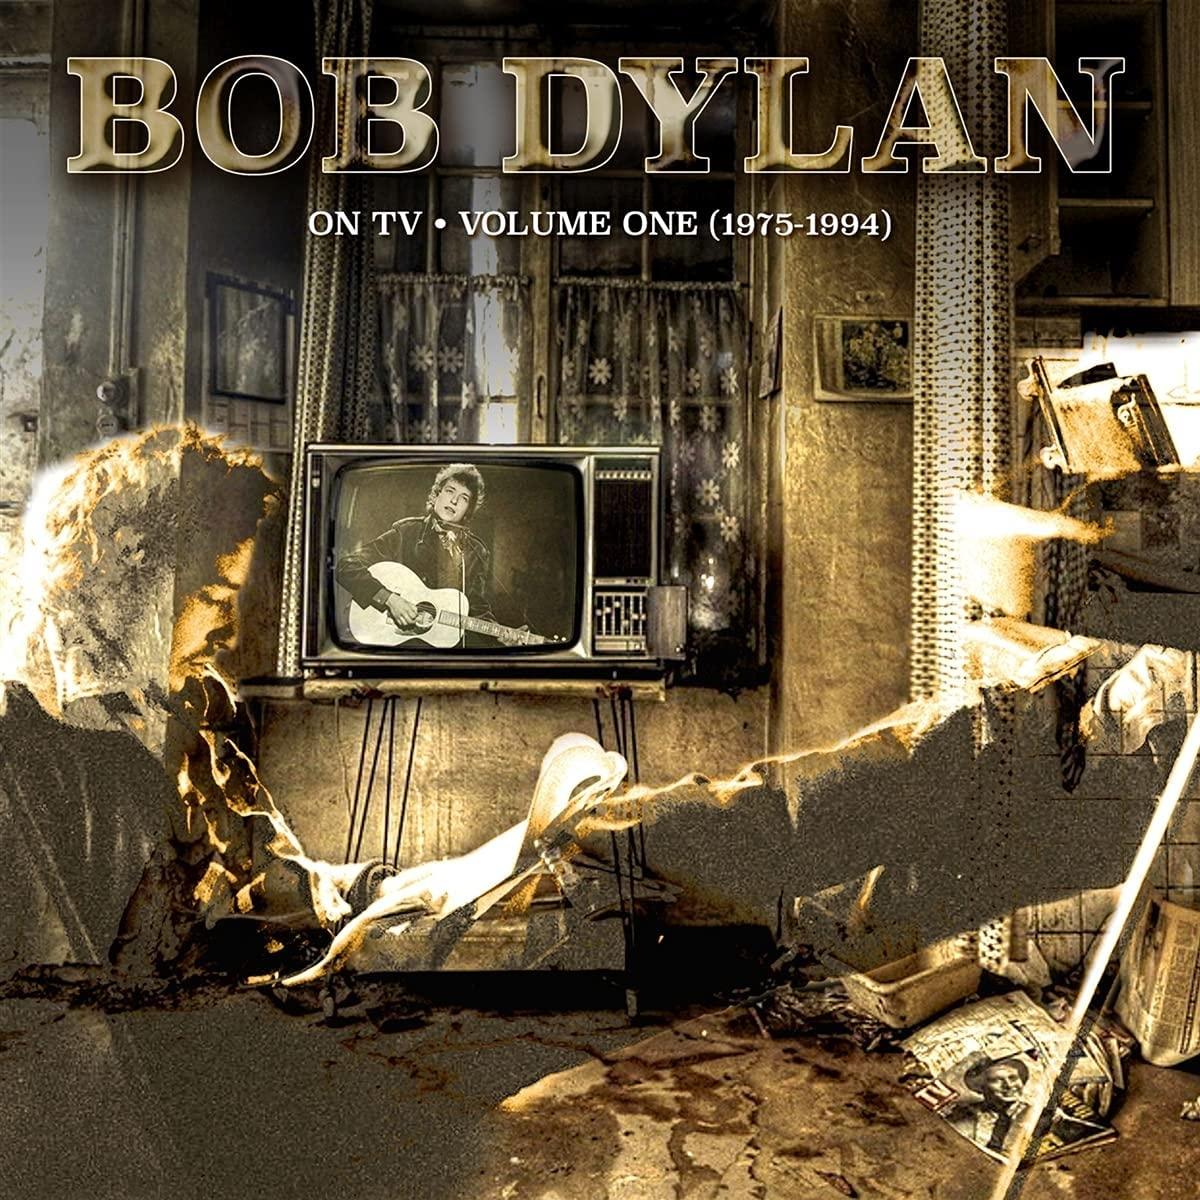 On TV - Volume 1 (1975-1994) (3CD)